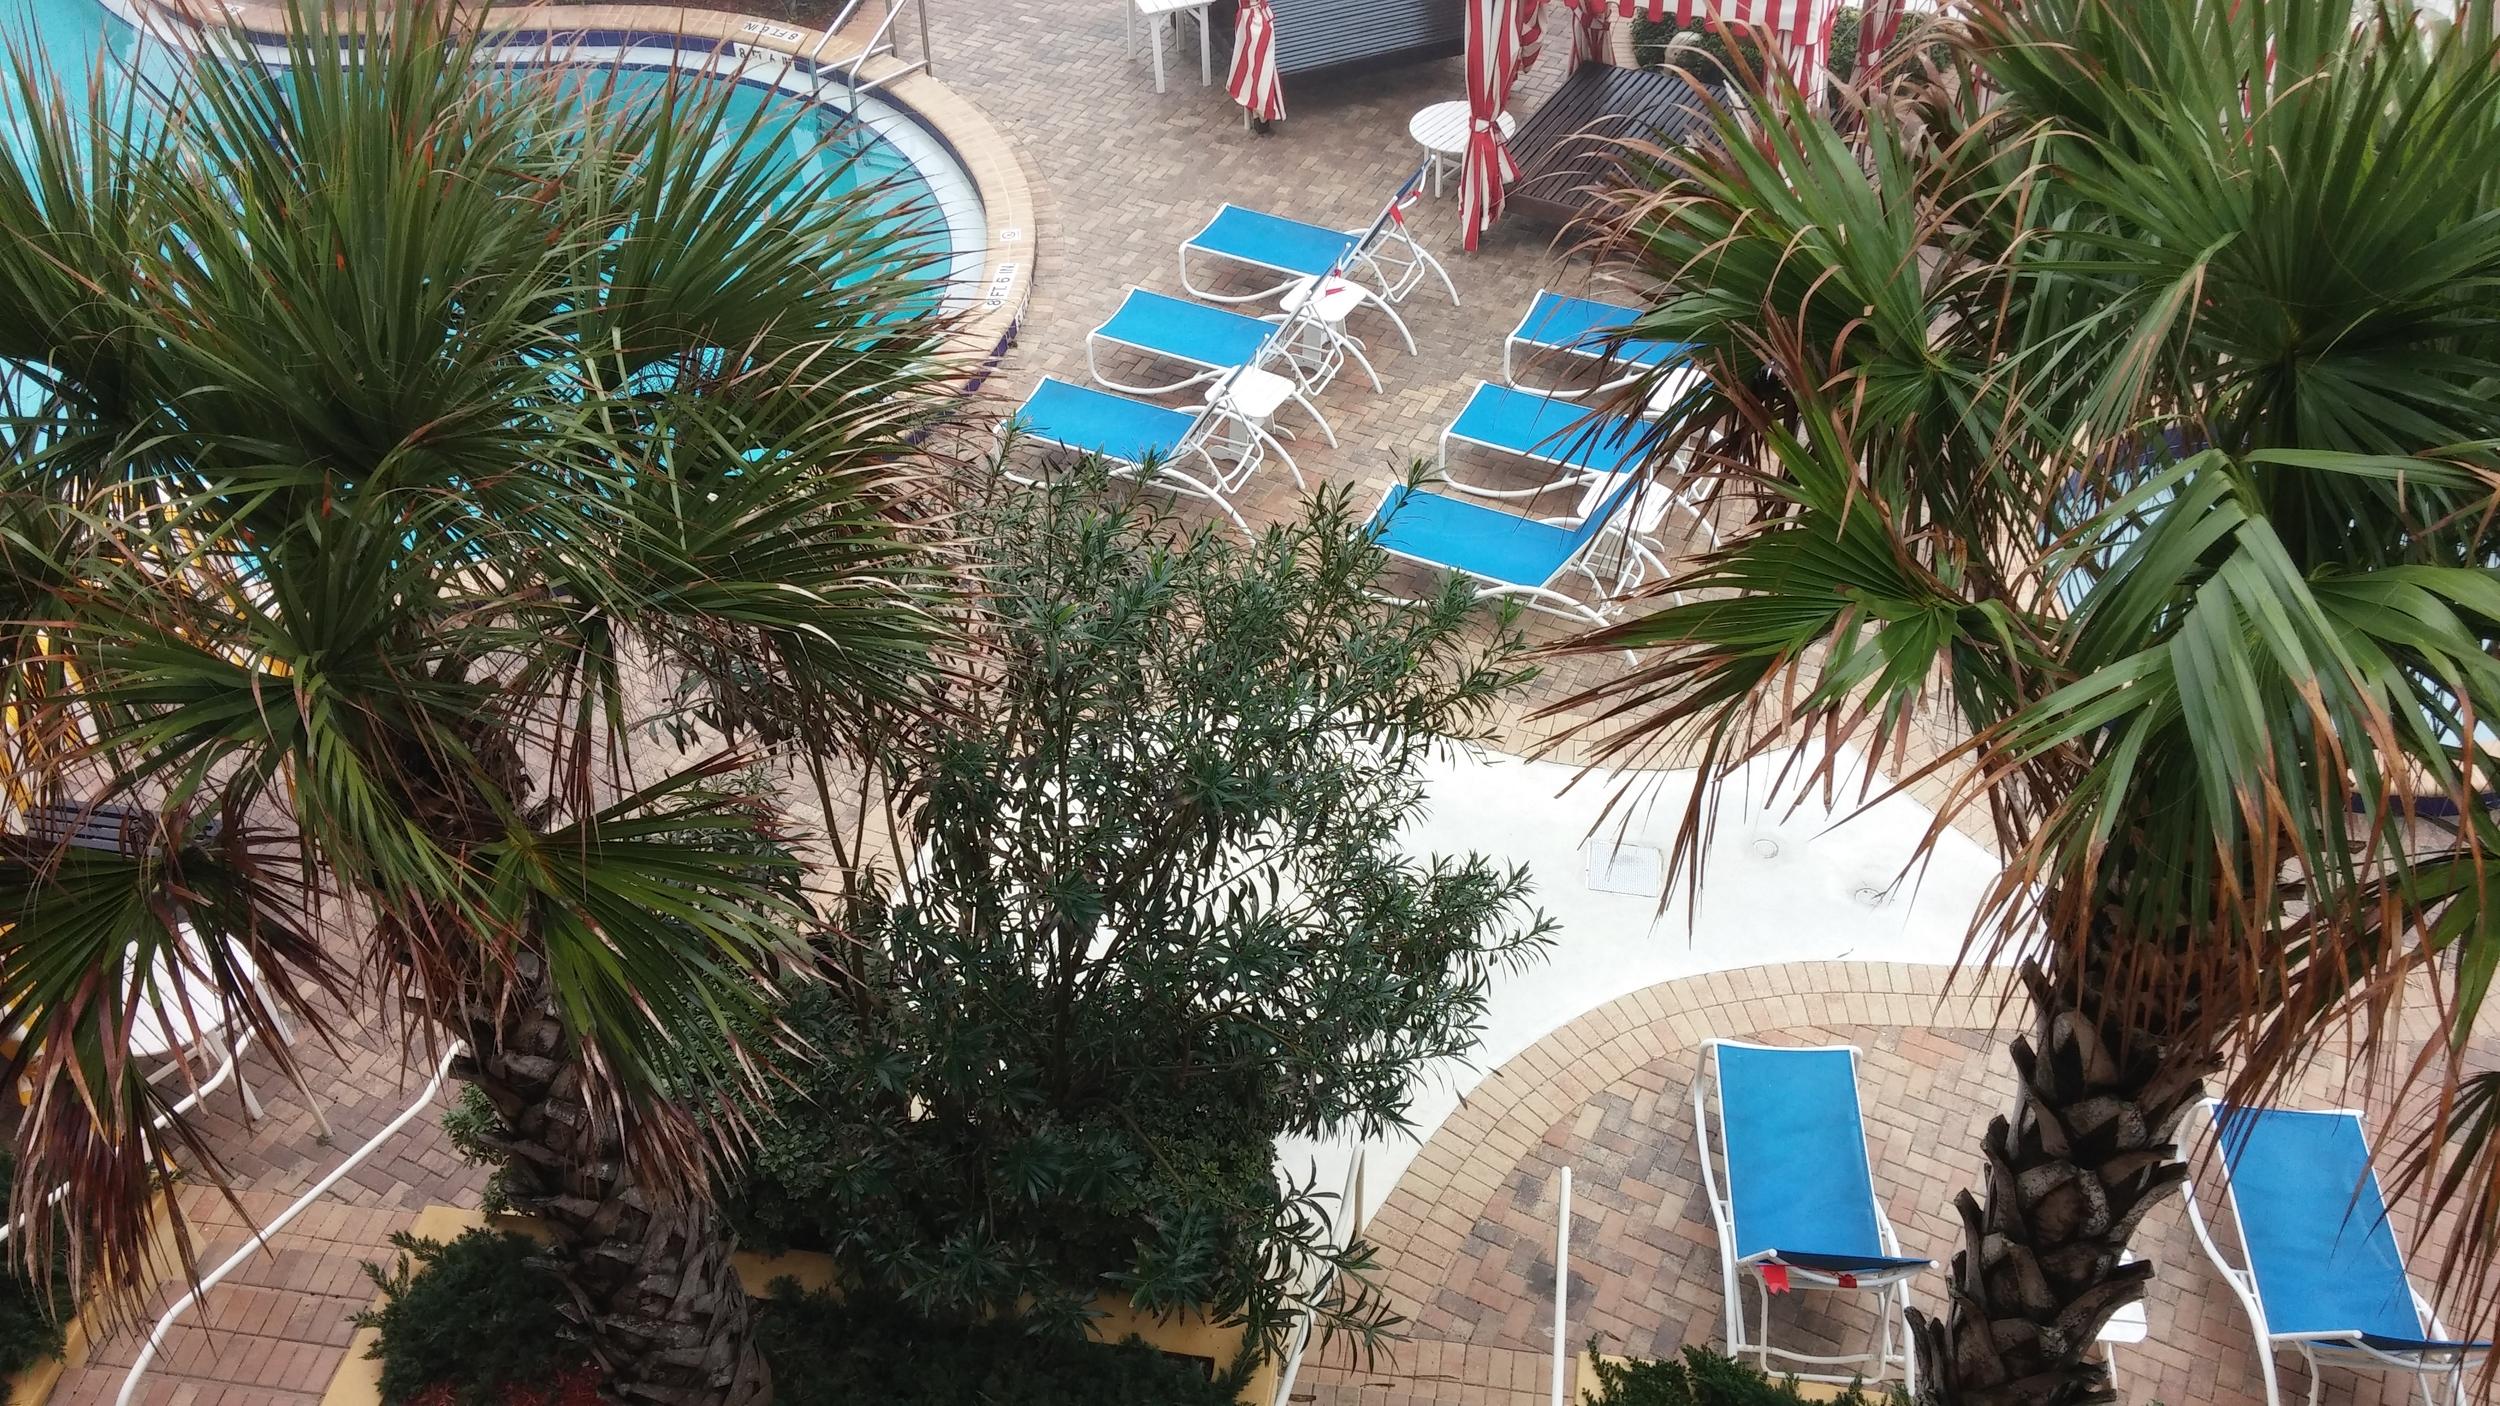 2016-01-08 The Shores Resort and Spa, Daytona Beach FL 6.jpg